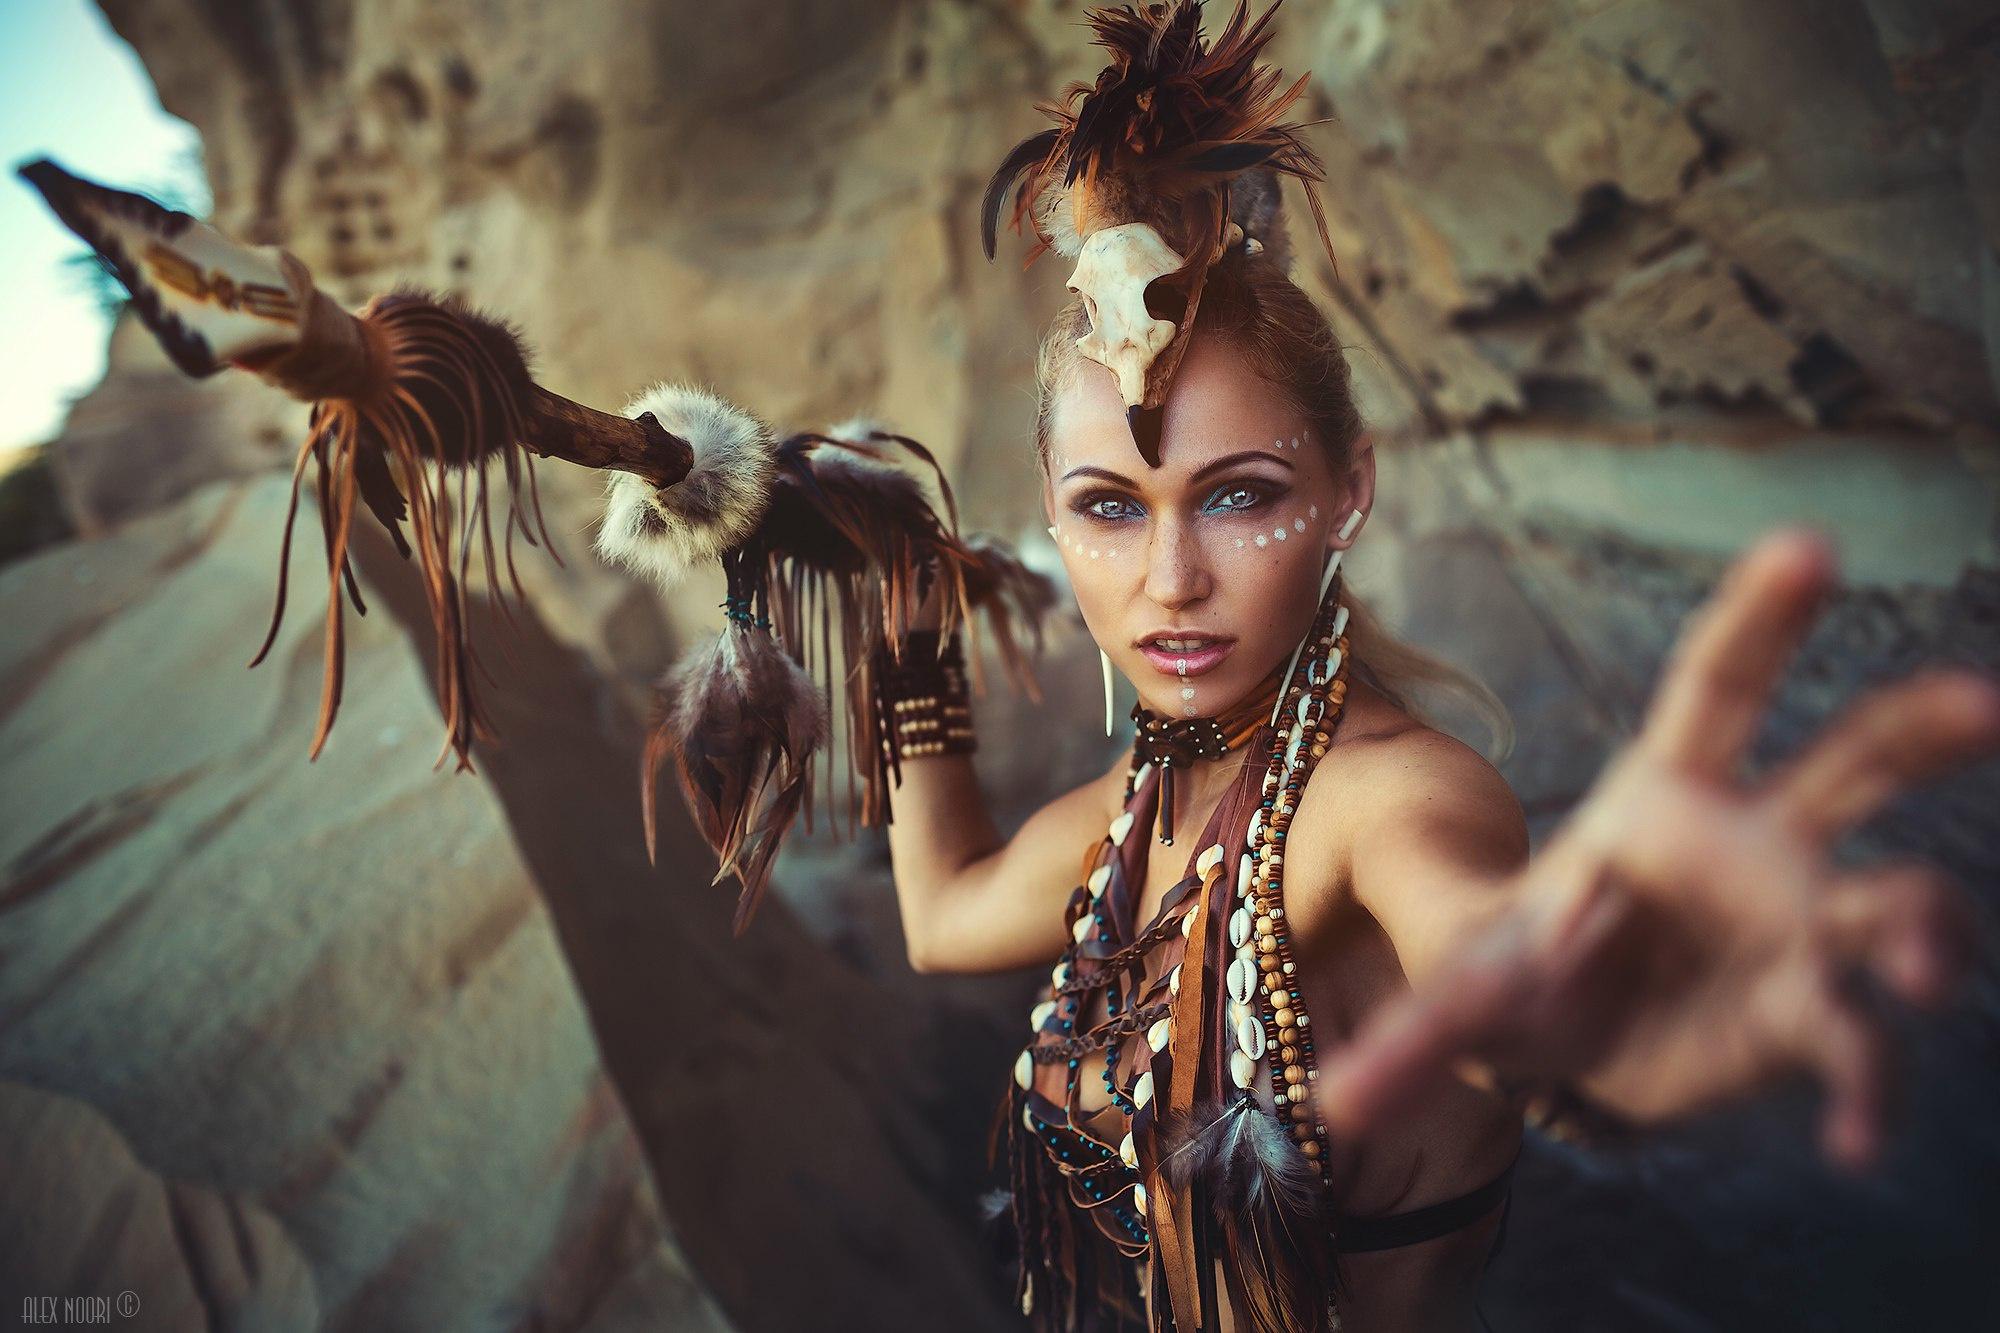 People 2000x1333 women cosplay fantasy girl spear model Alex Noori